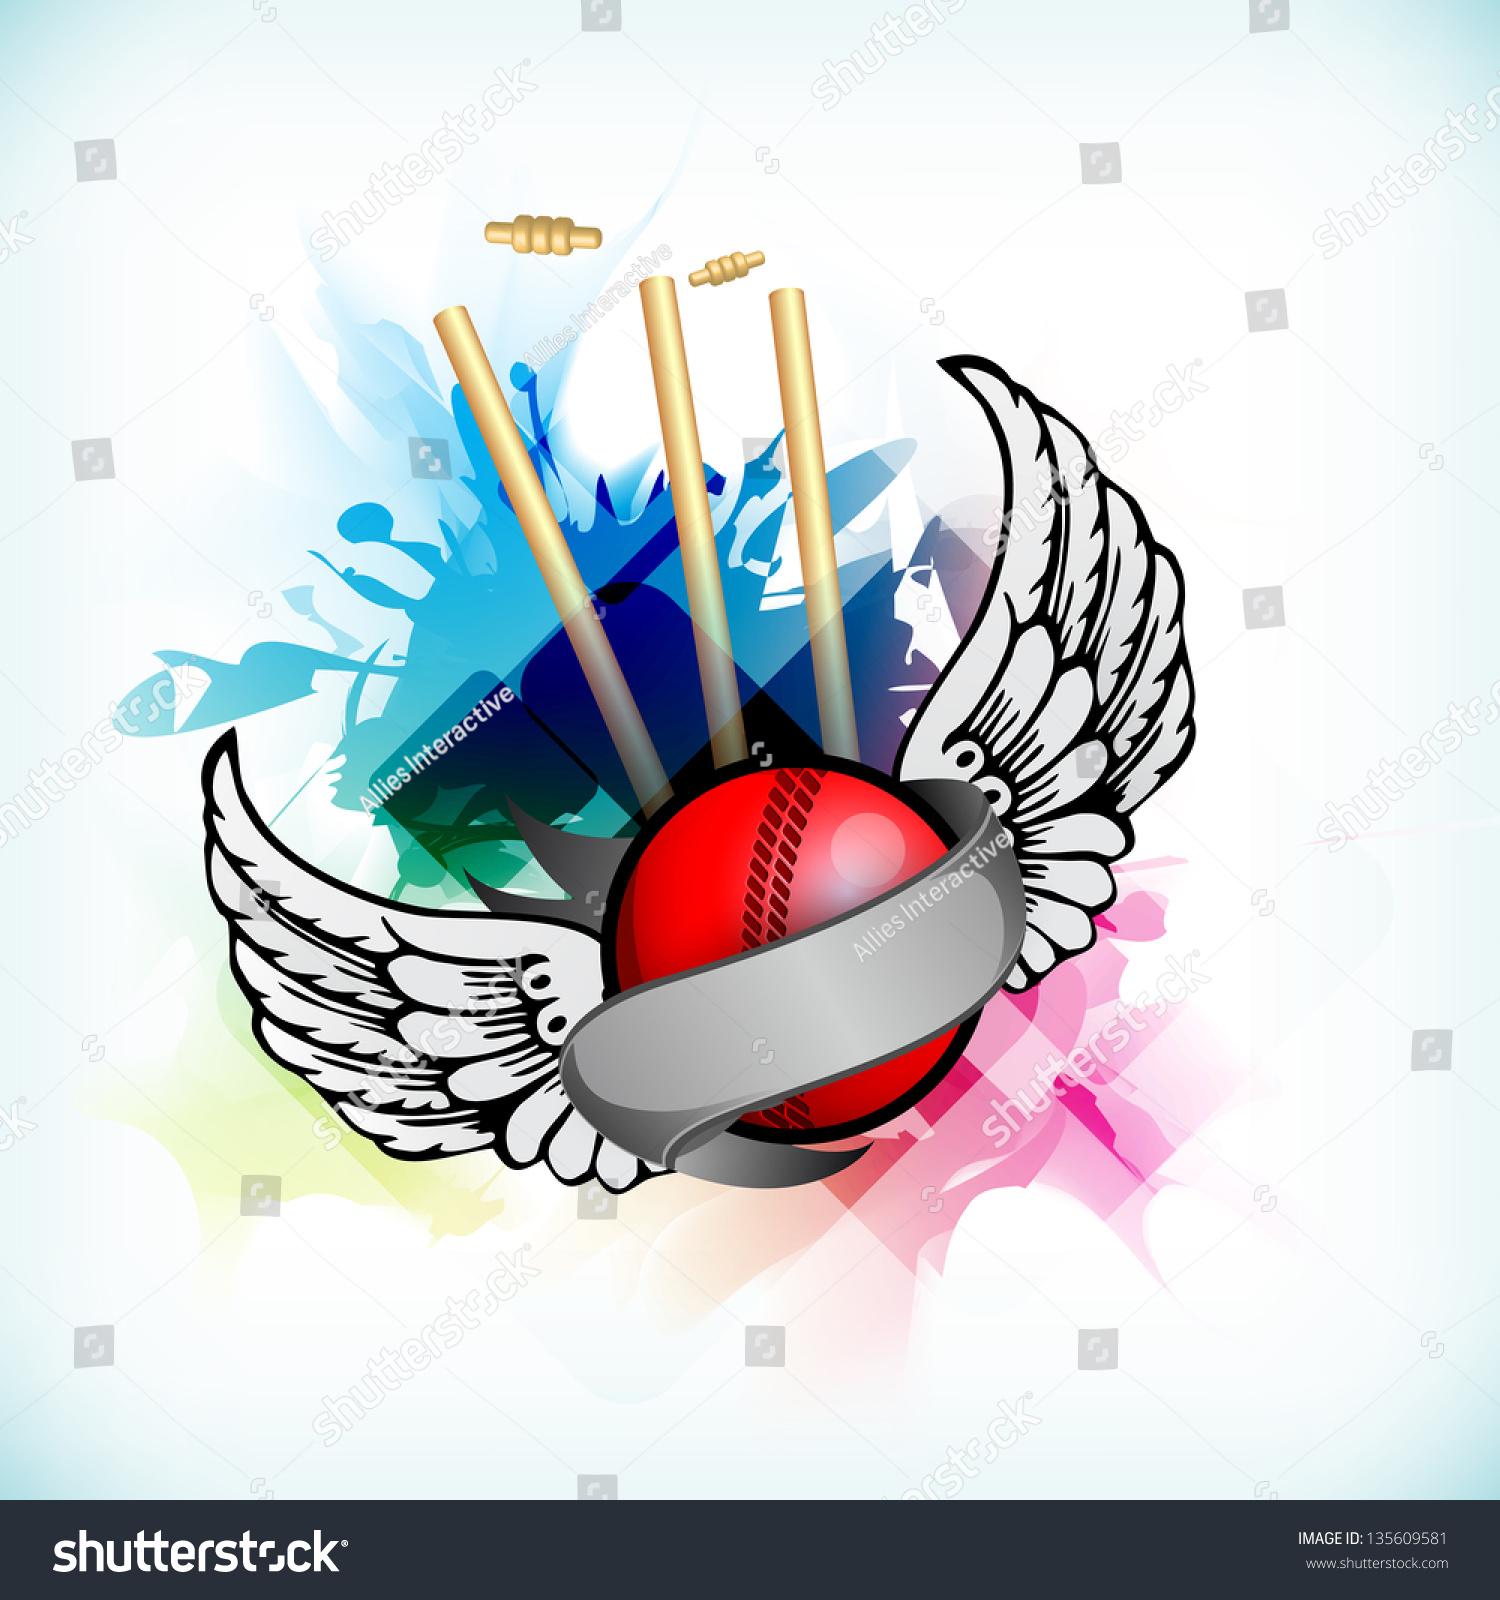 Naino Bat Dawnload Song: Abstract Cricket Background Ball On Stumps Stock Vector